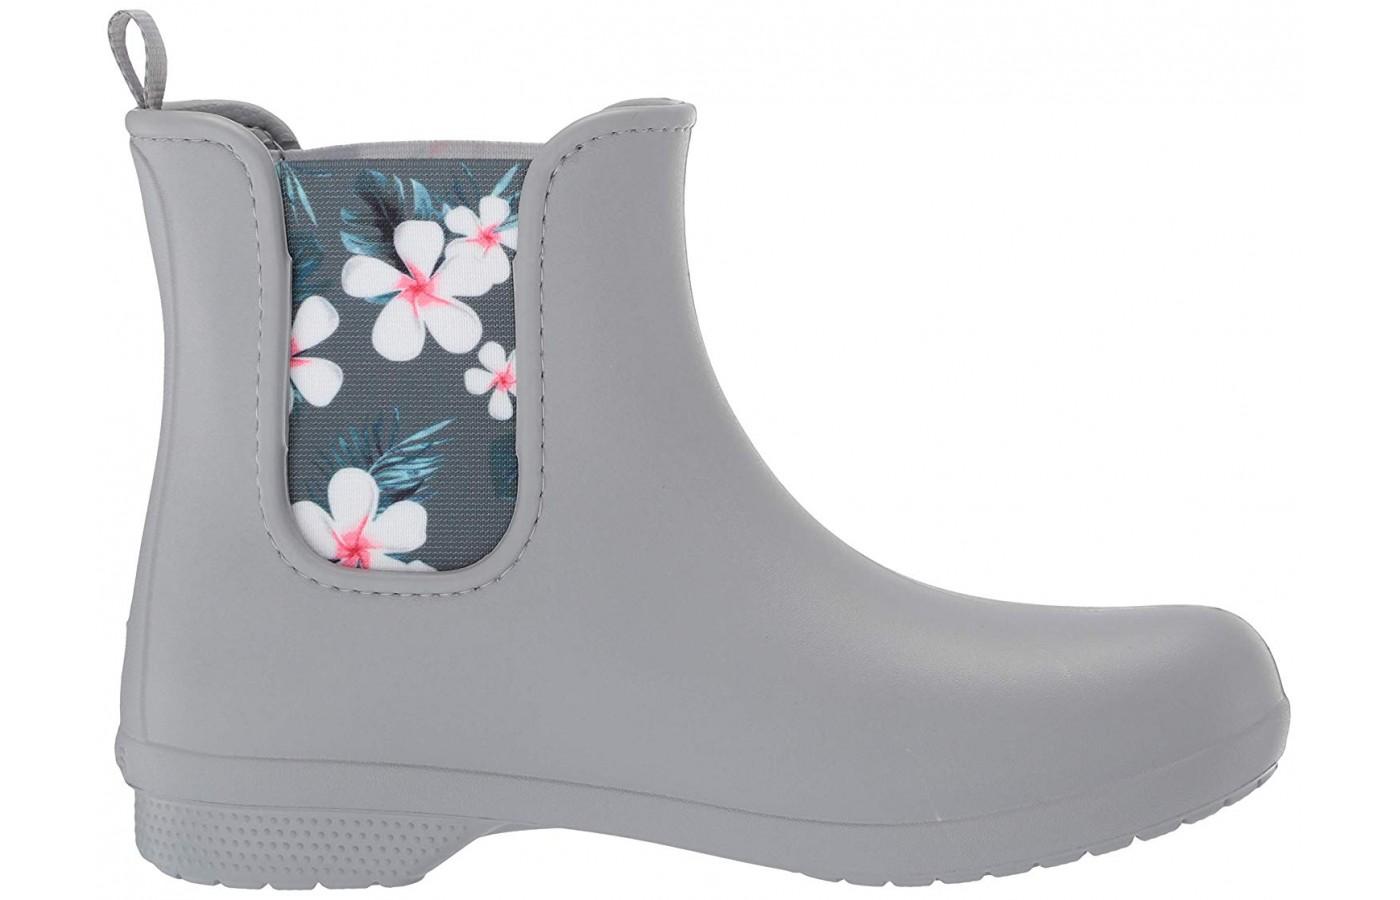 Crocs Freesail Chelsea Heel